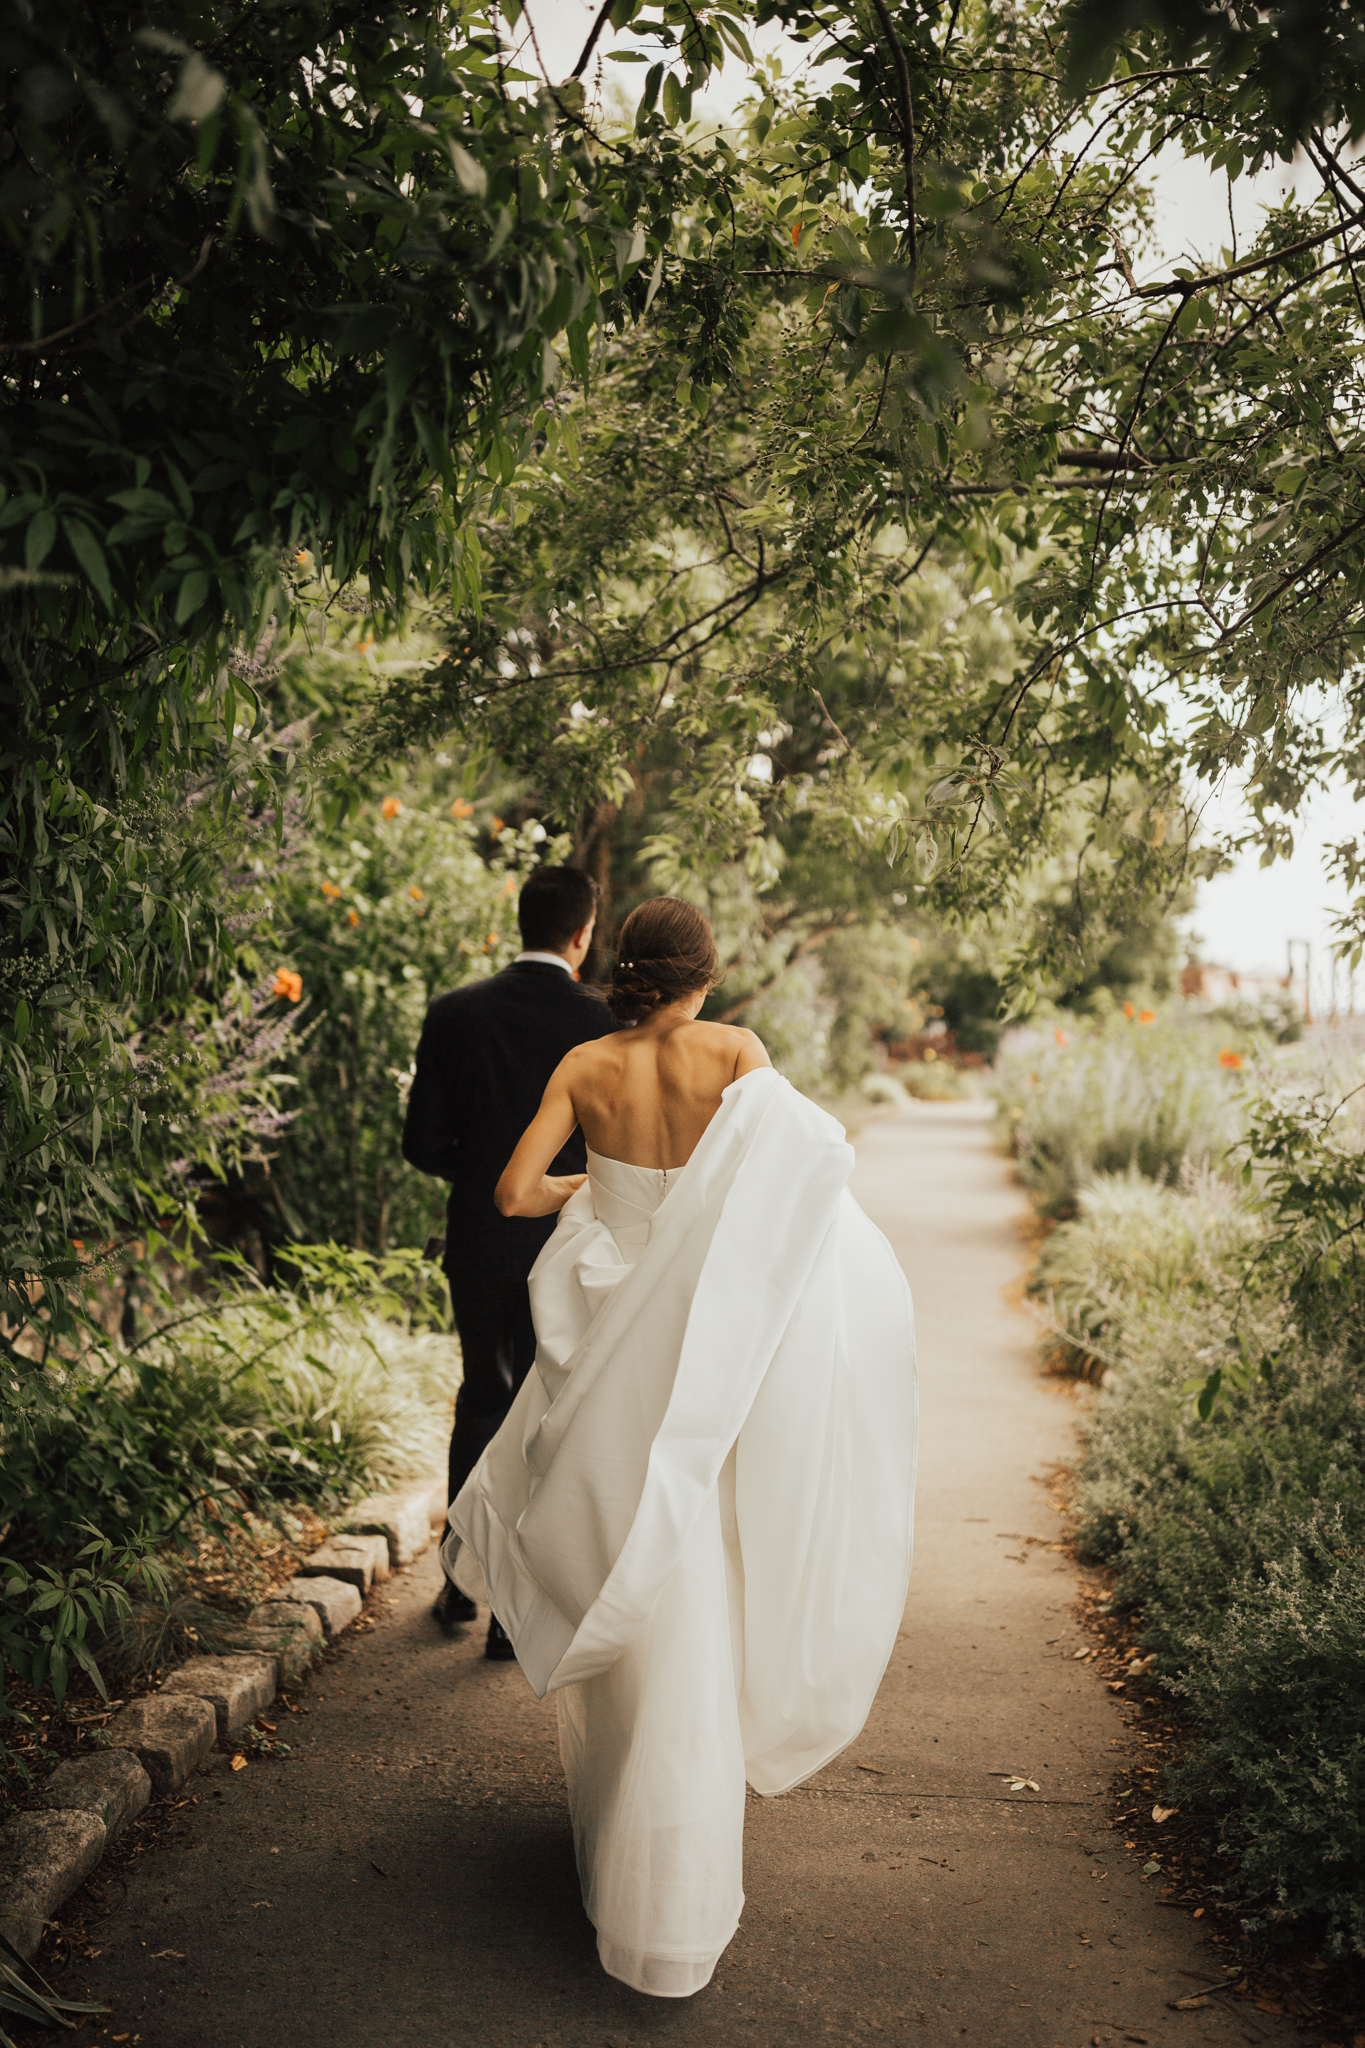 liberty_warehouse_wedding-59.jpg